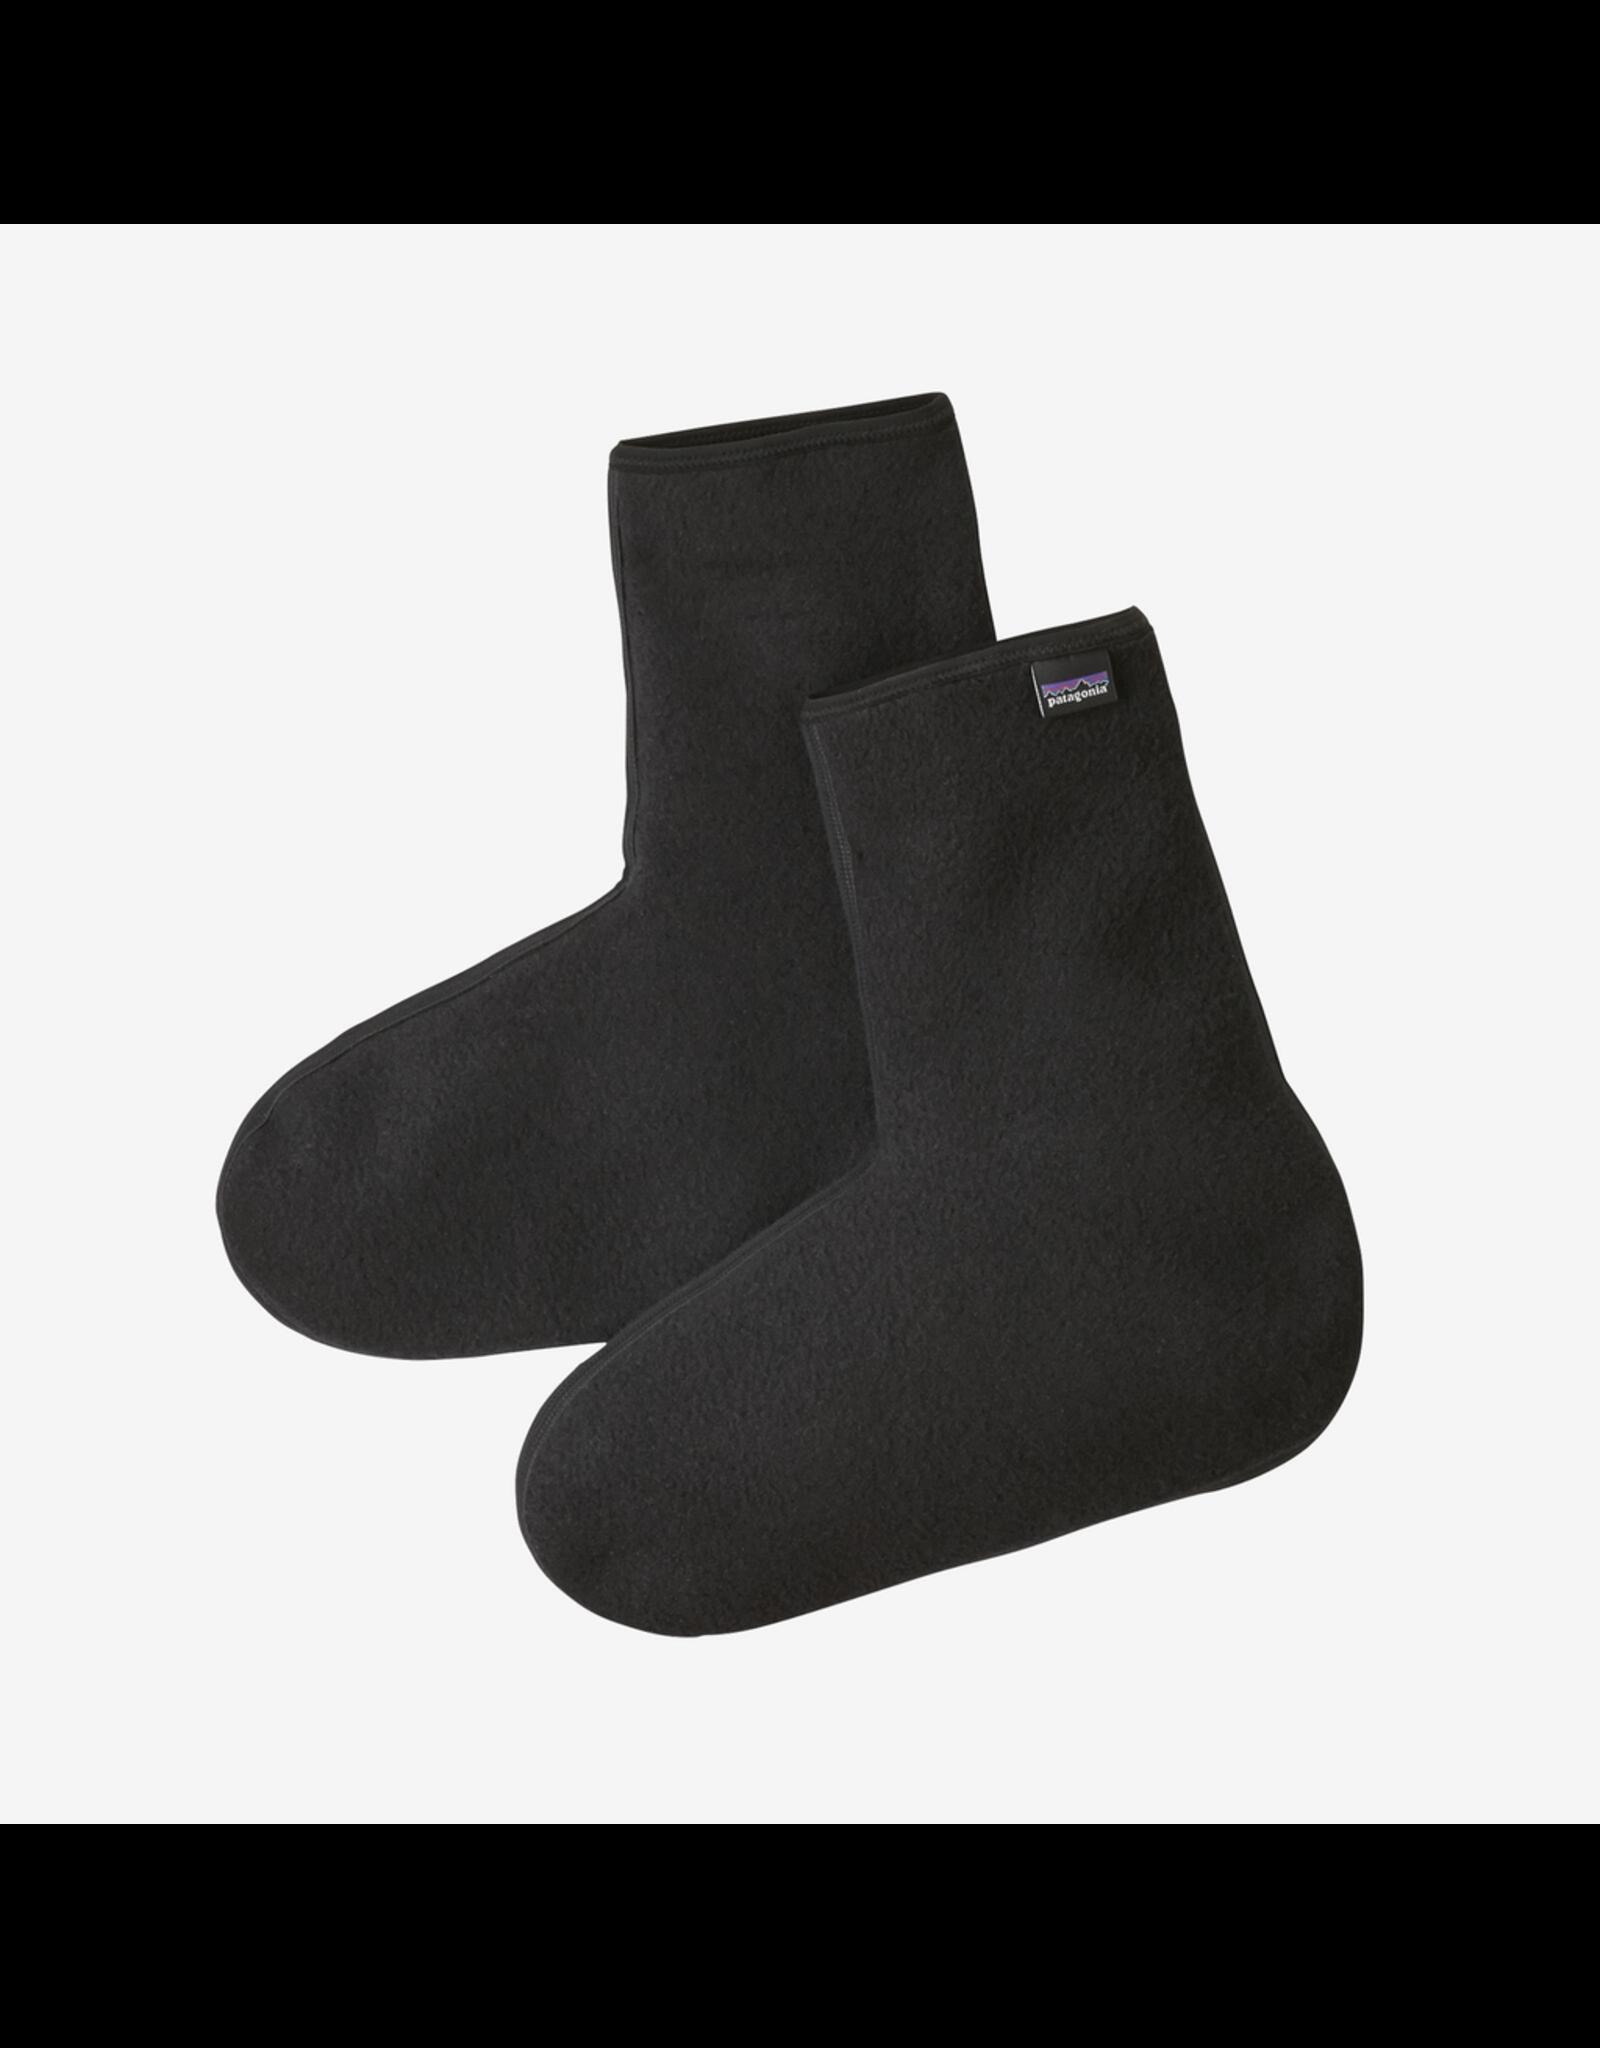 Patagonia Winter Weight Fleece Socks